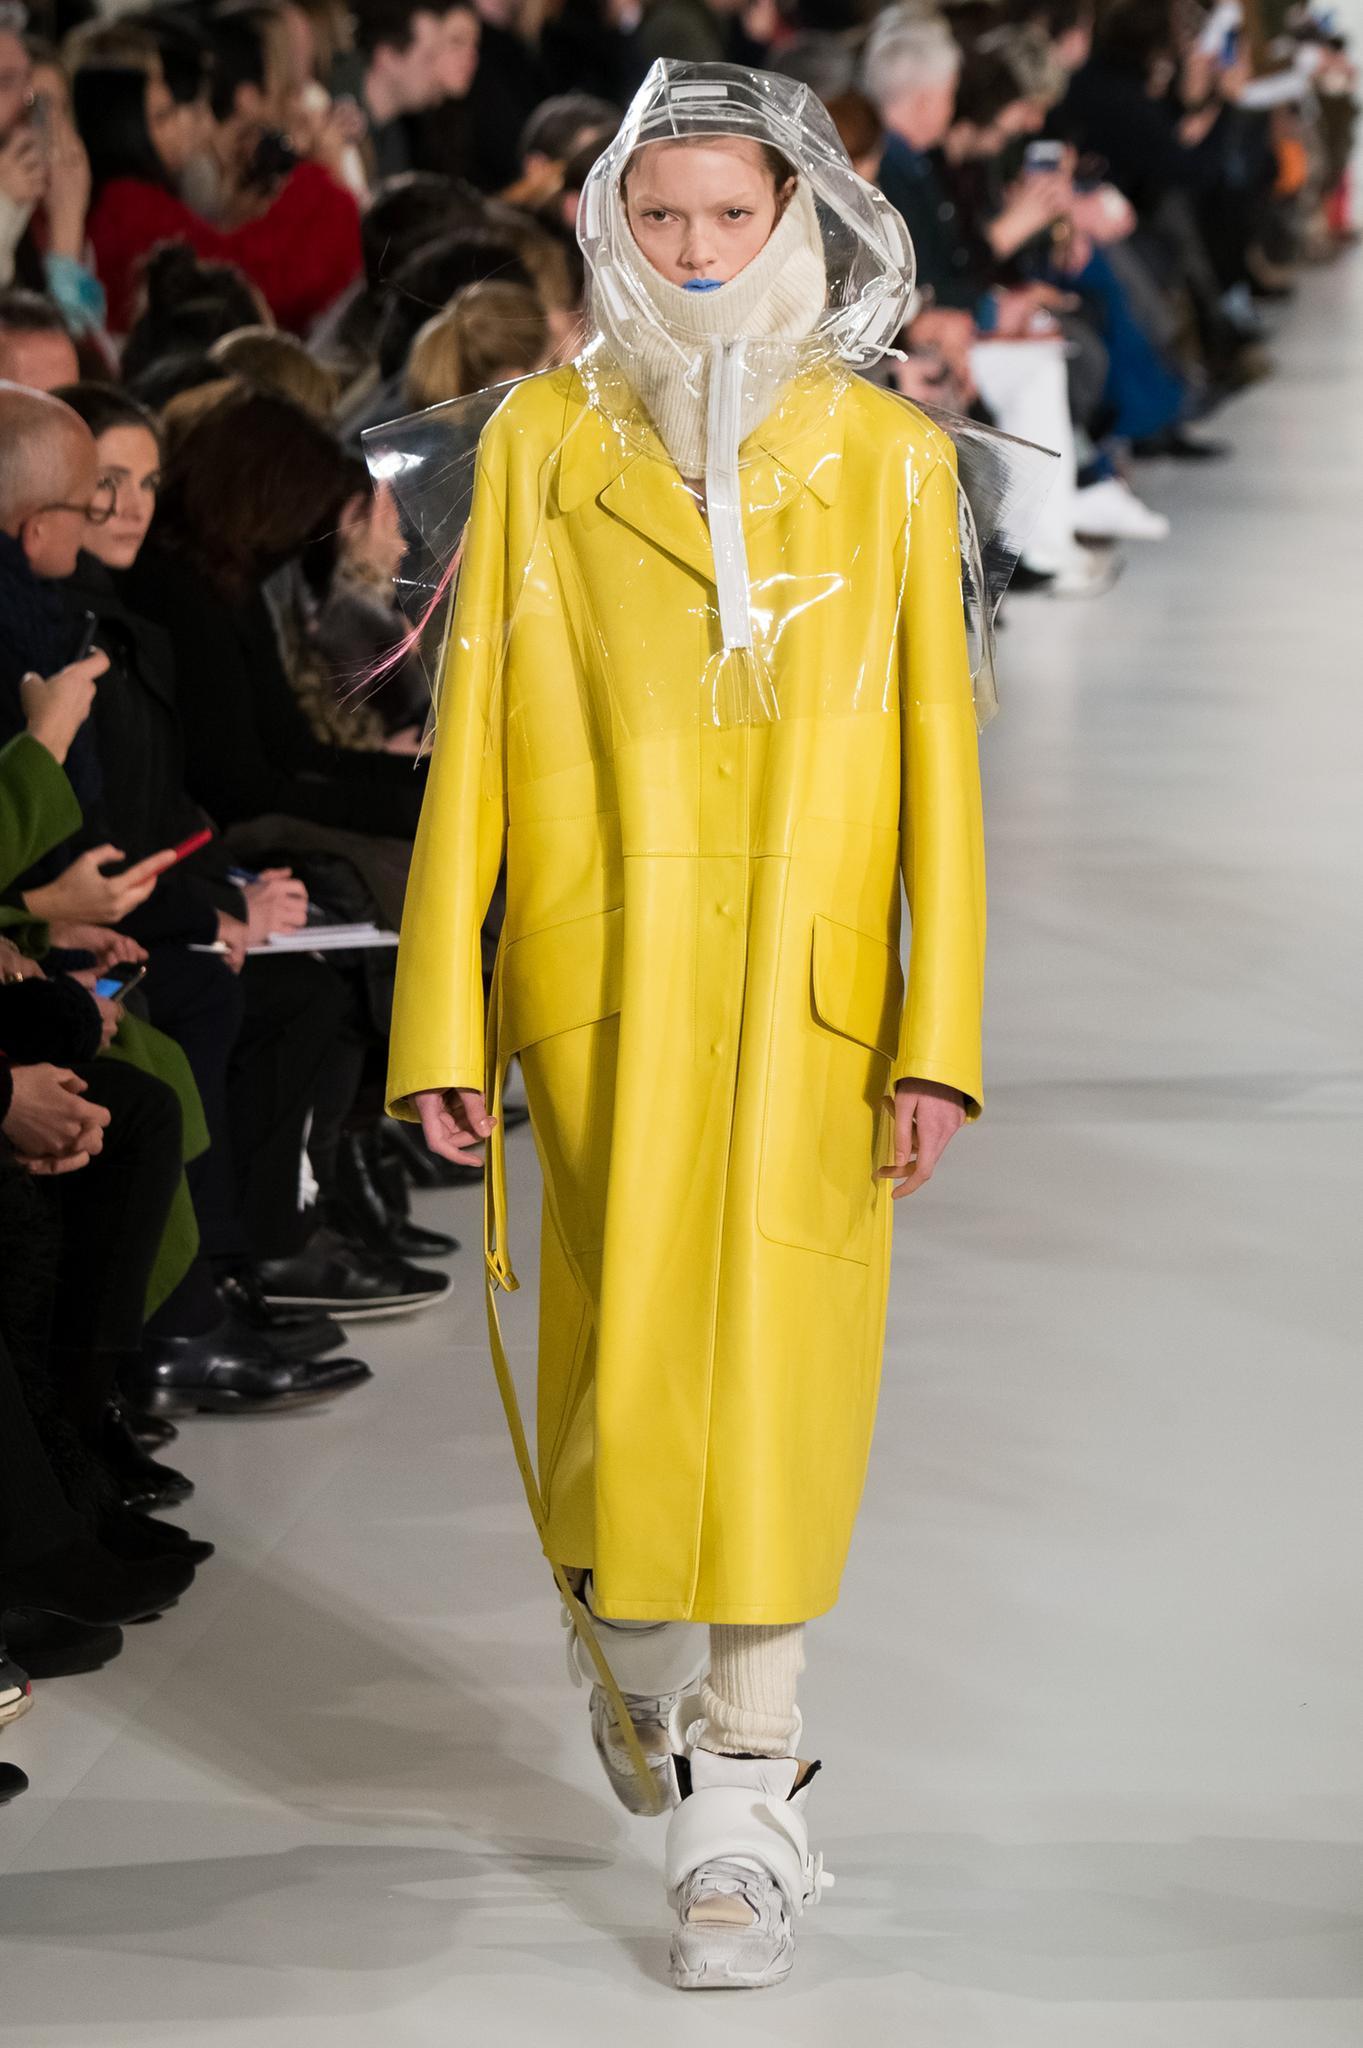 Paris Fashion Week: Model bei Maison Margiela